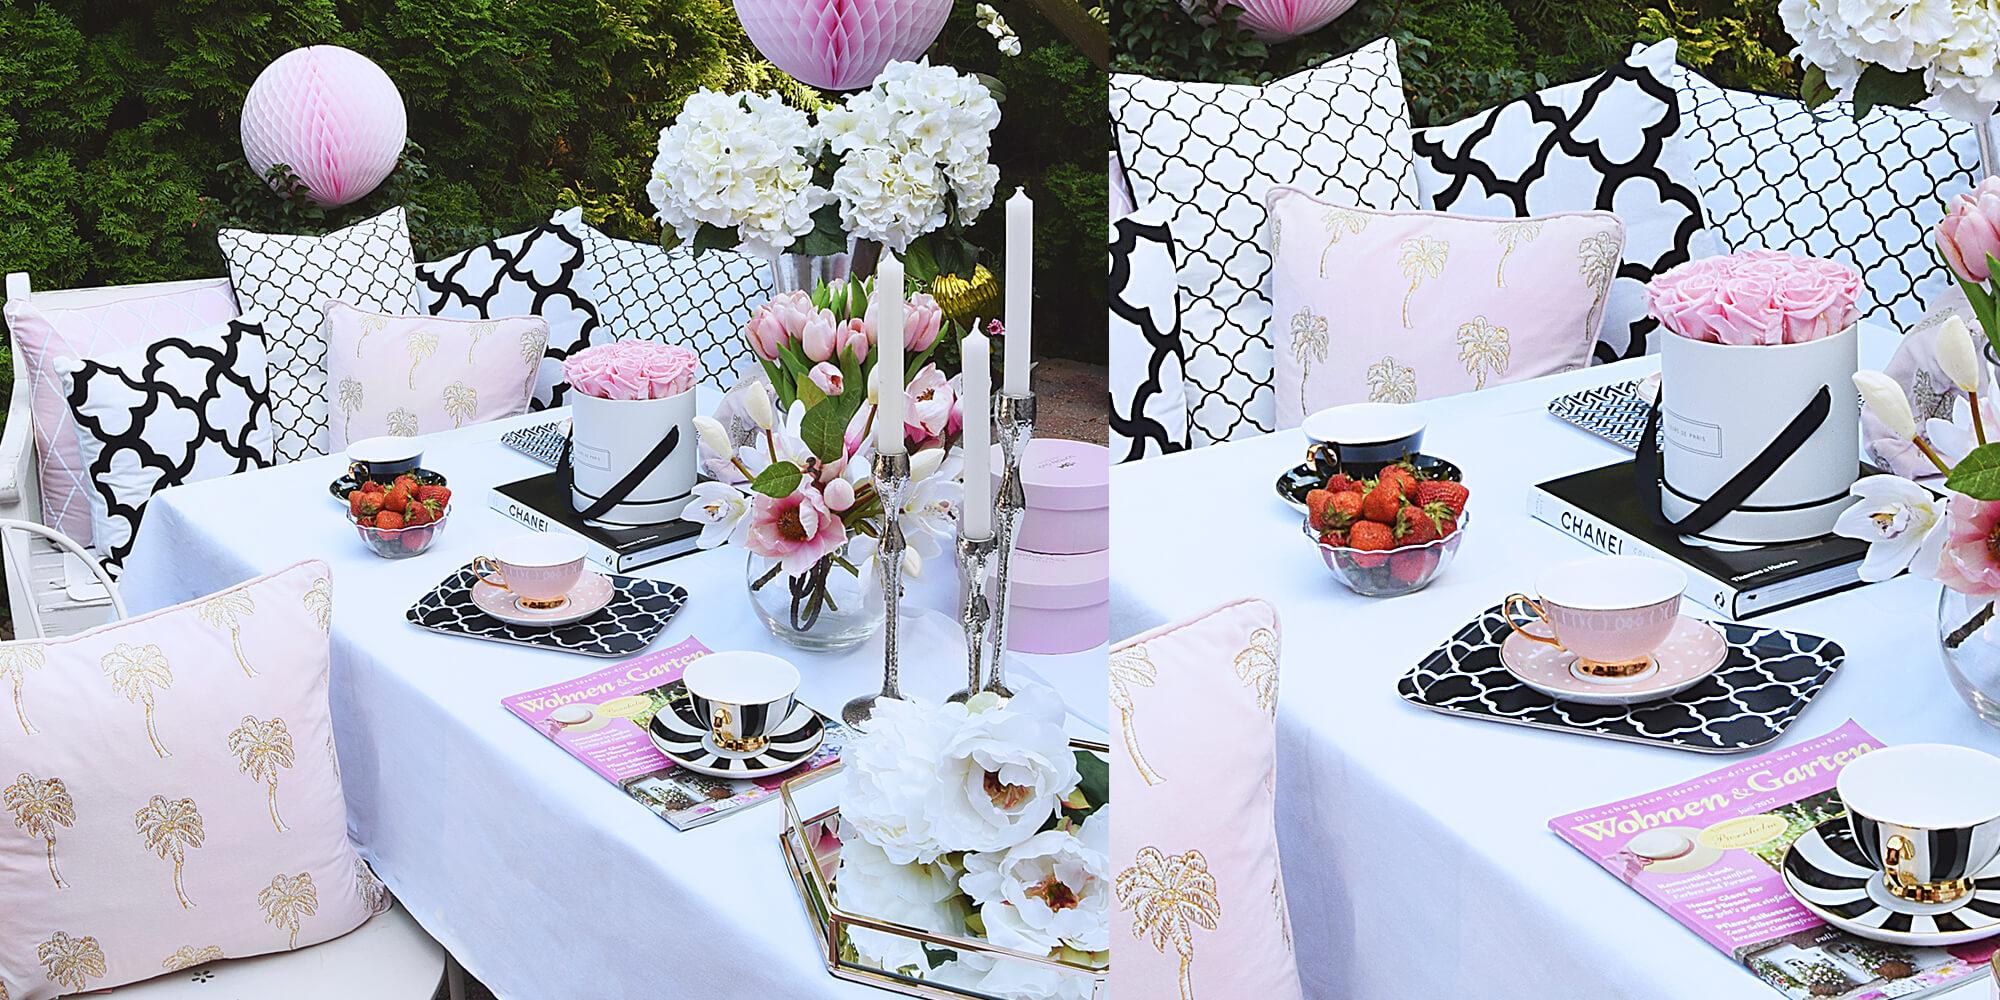 Gartenparty! Deko in Pastellrosa